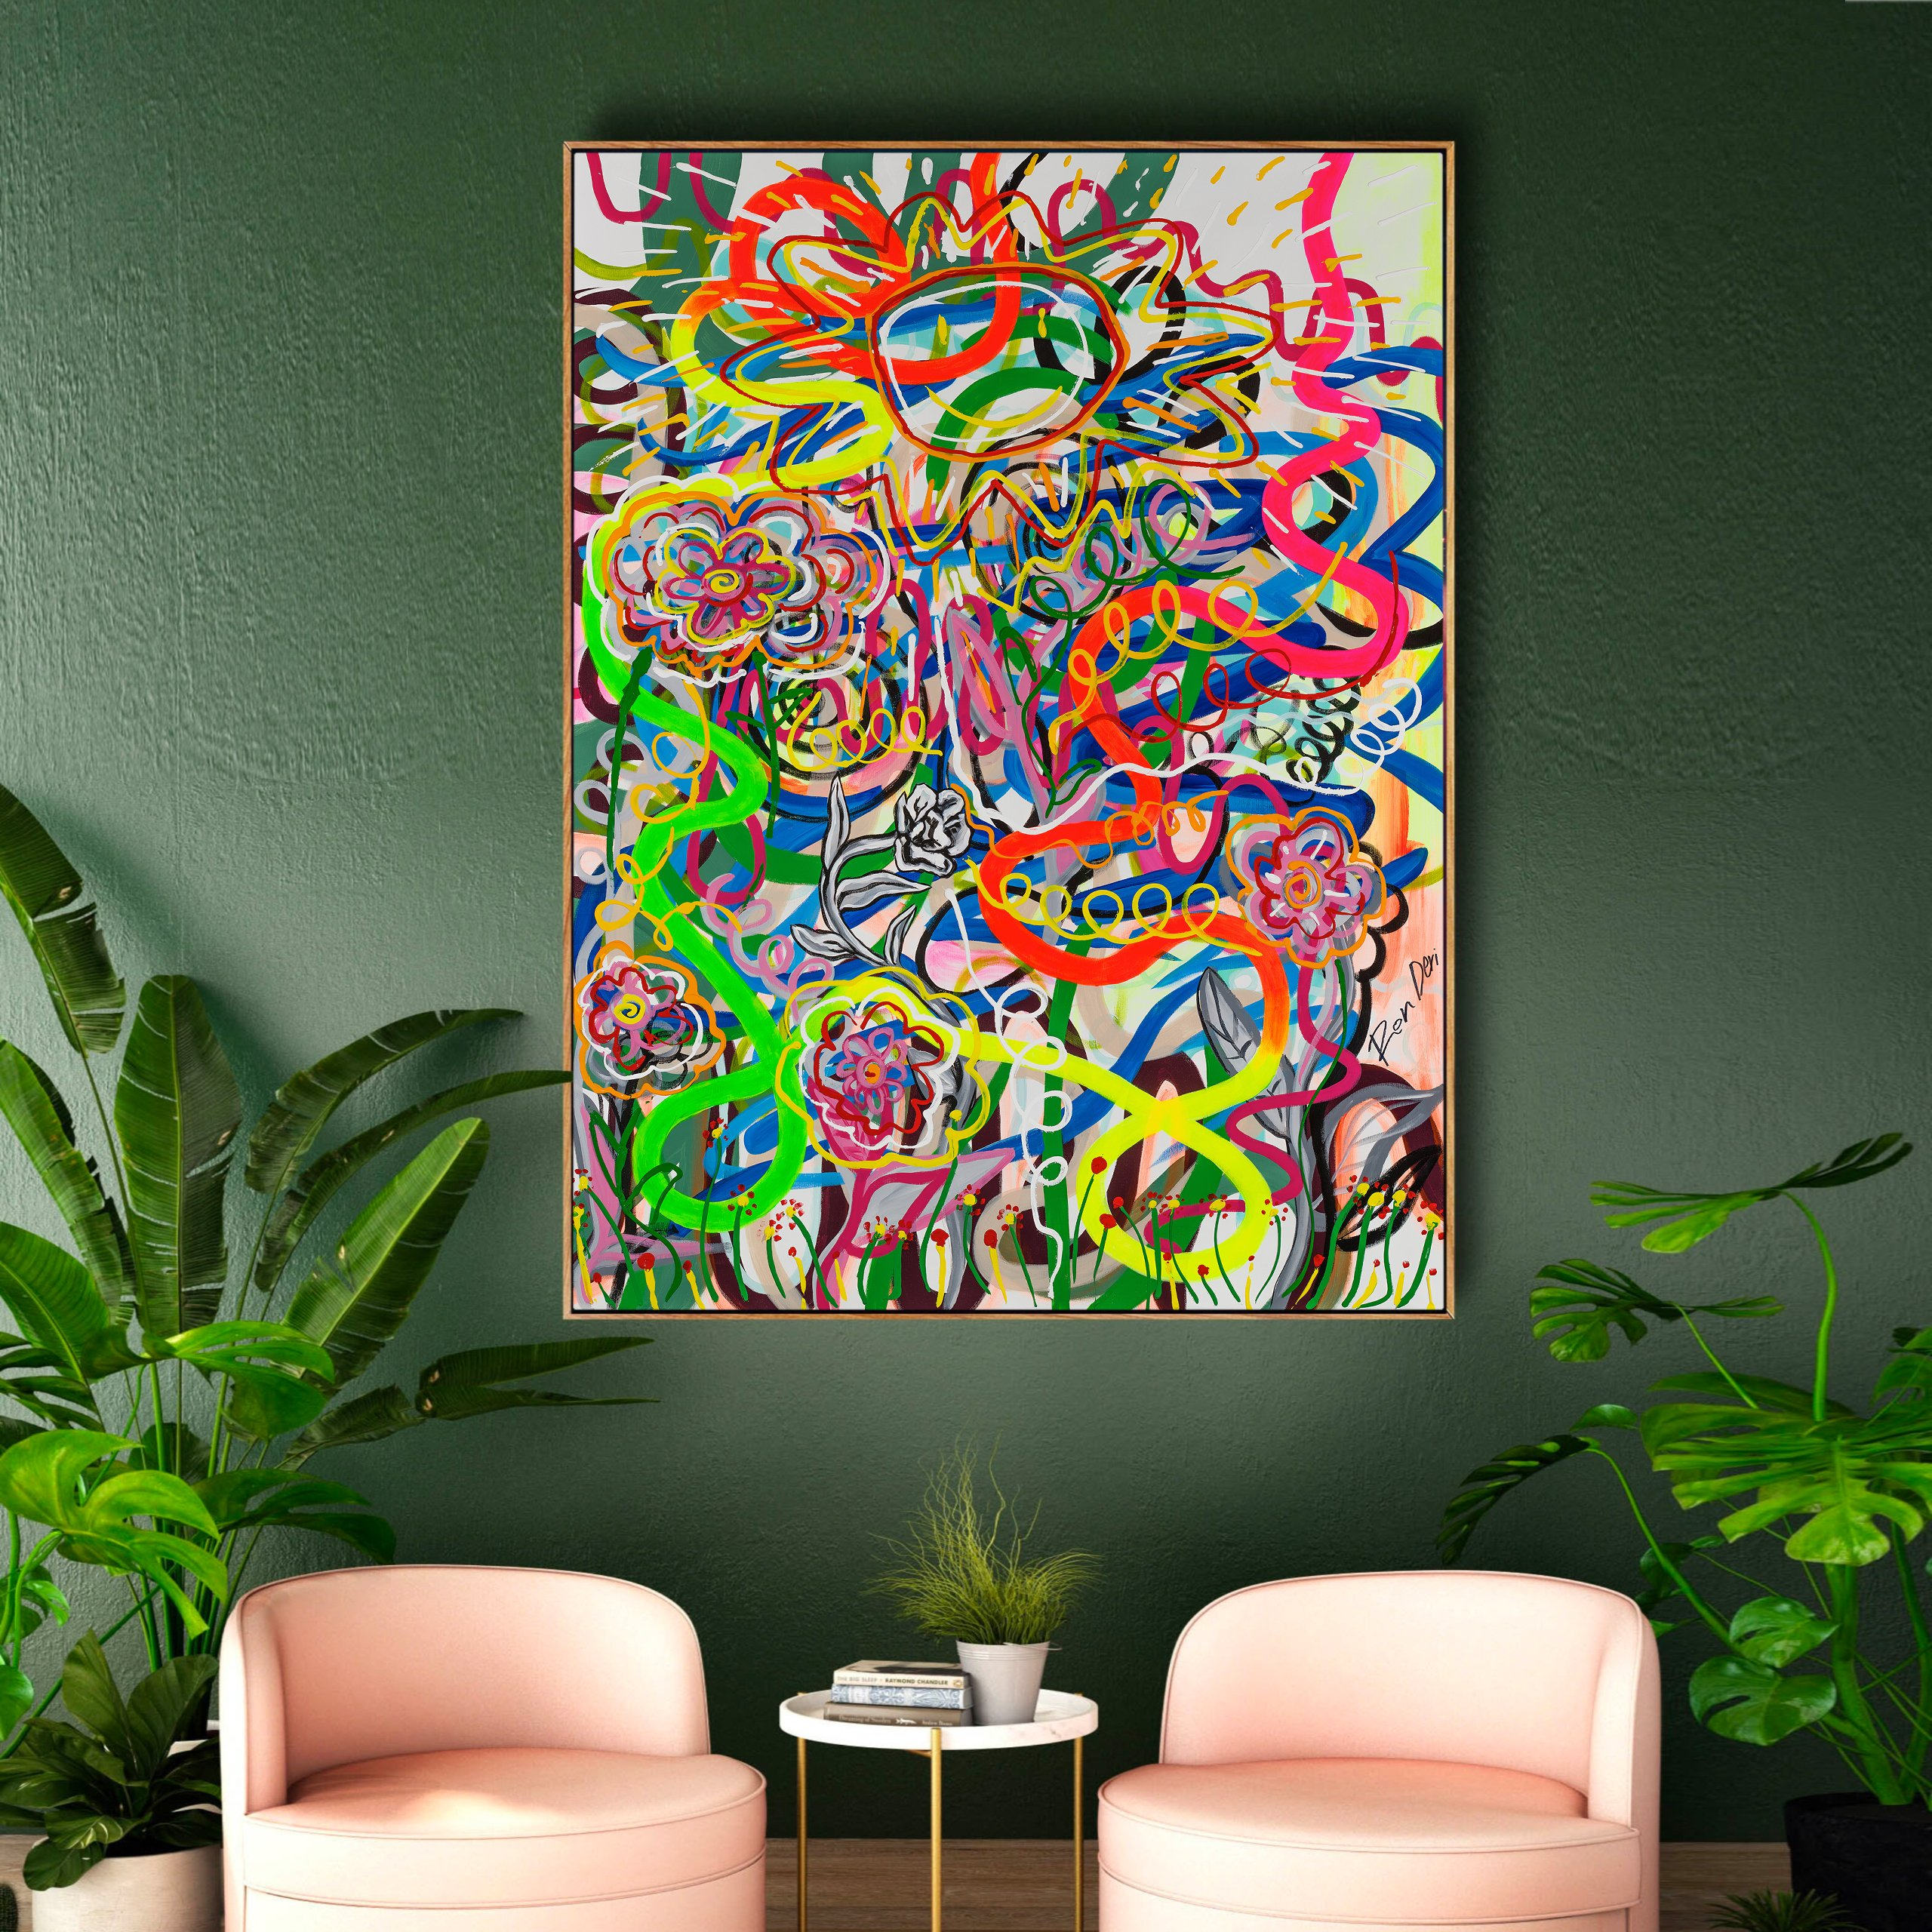 ron-deri-embrace-the-sun-interior-design-painting-art